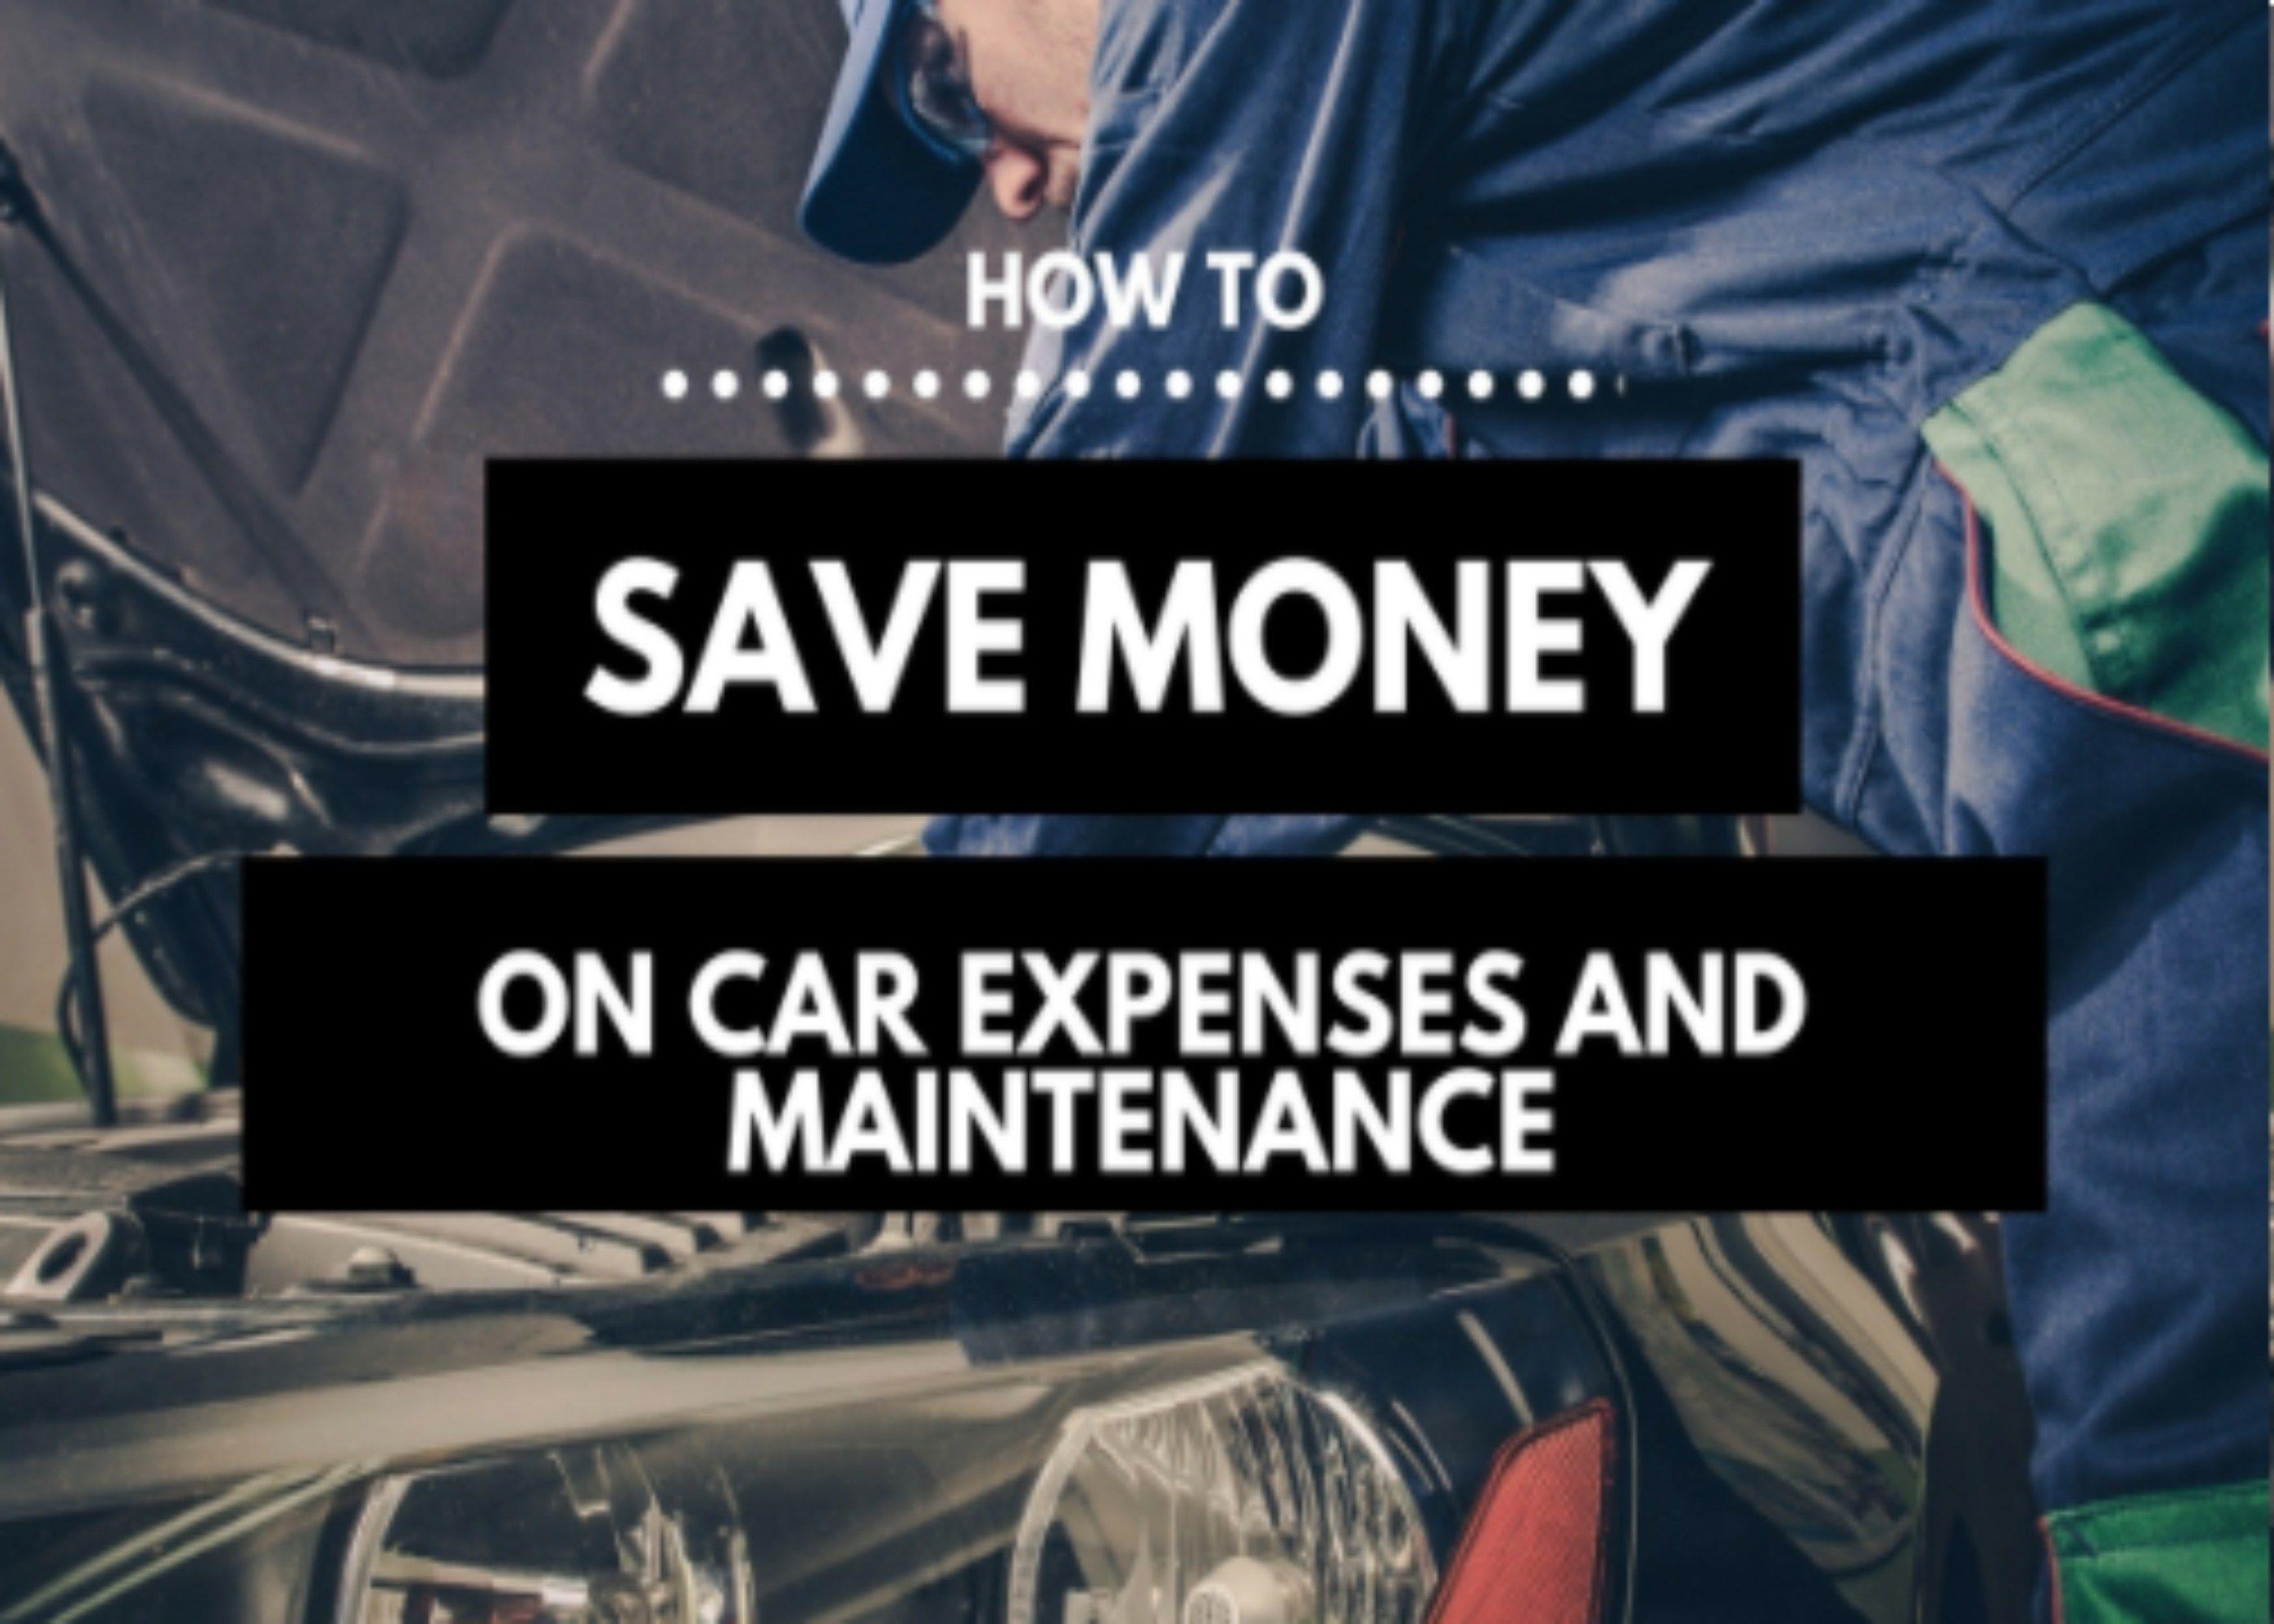 Save money on car expenses saving money saving tips